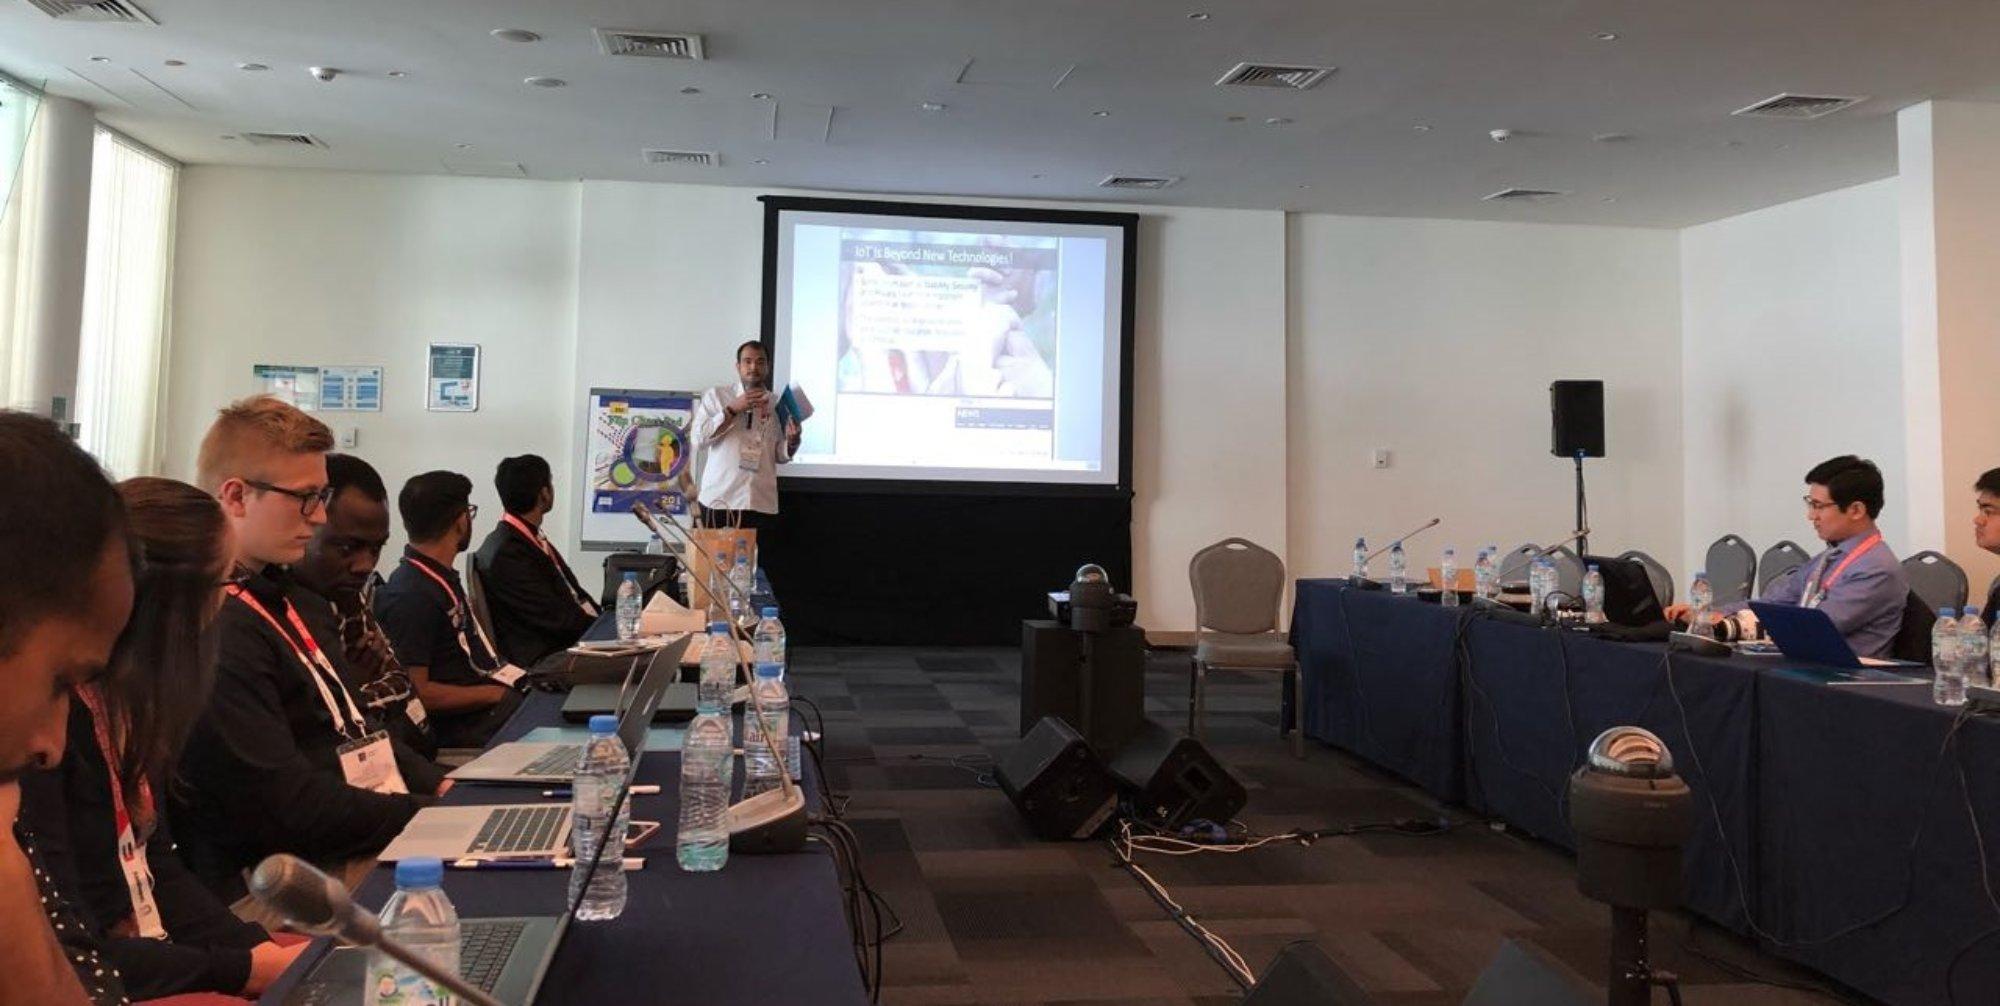 رحمانپور از لینکپ در آیکن ۶۰ (ICANN60)